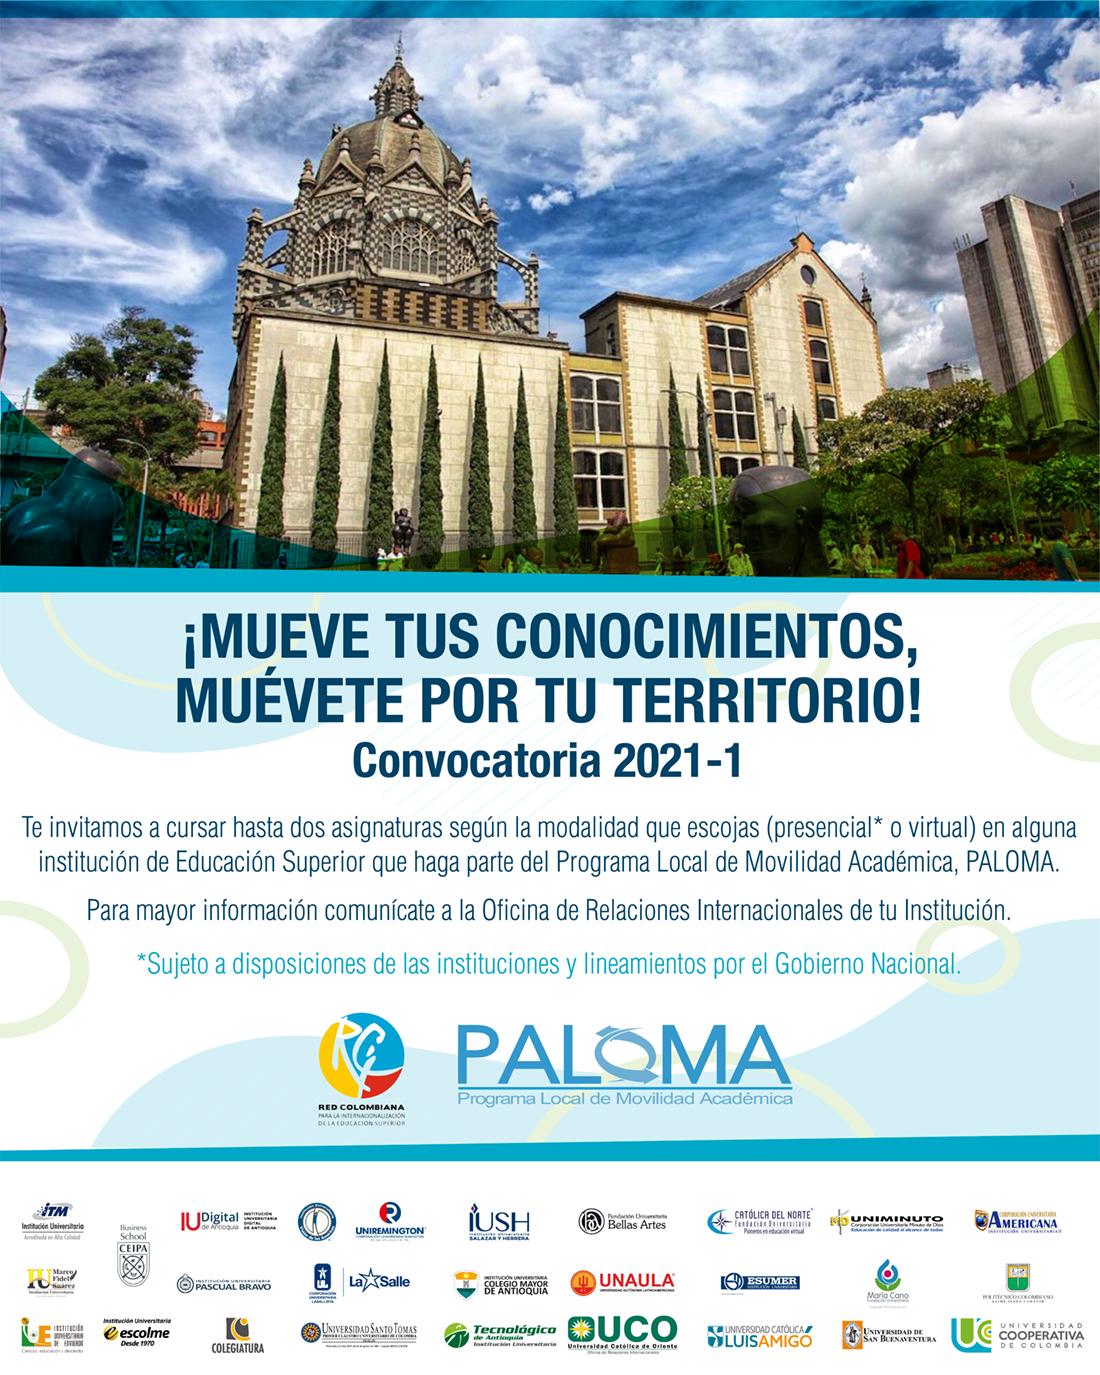 Convocatoria PALOMA virtual 2021-1